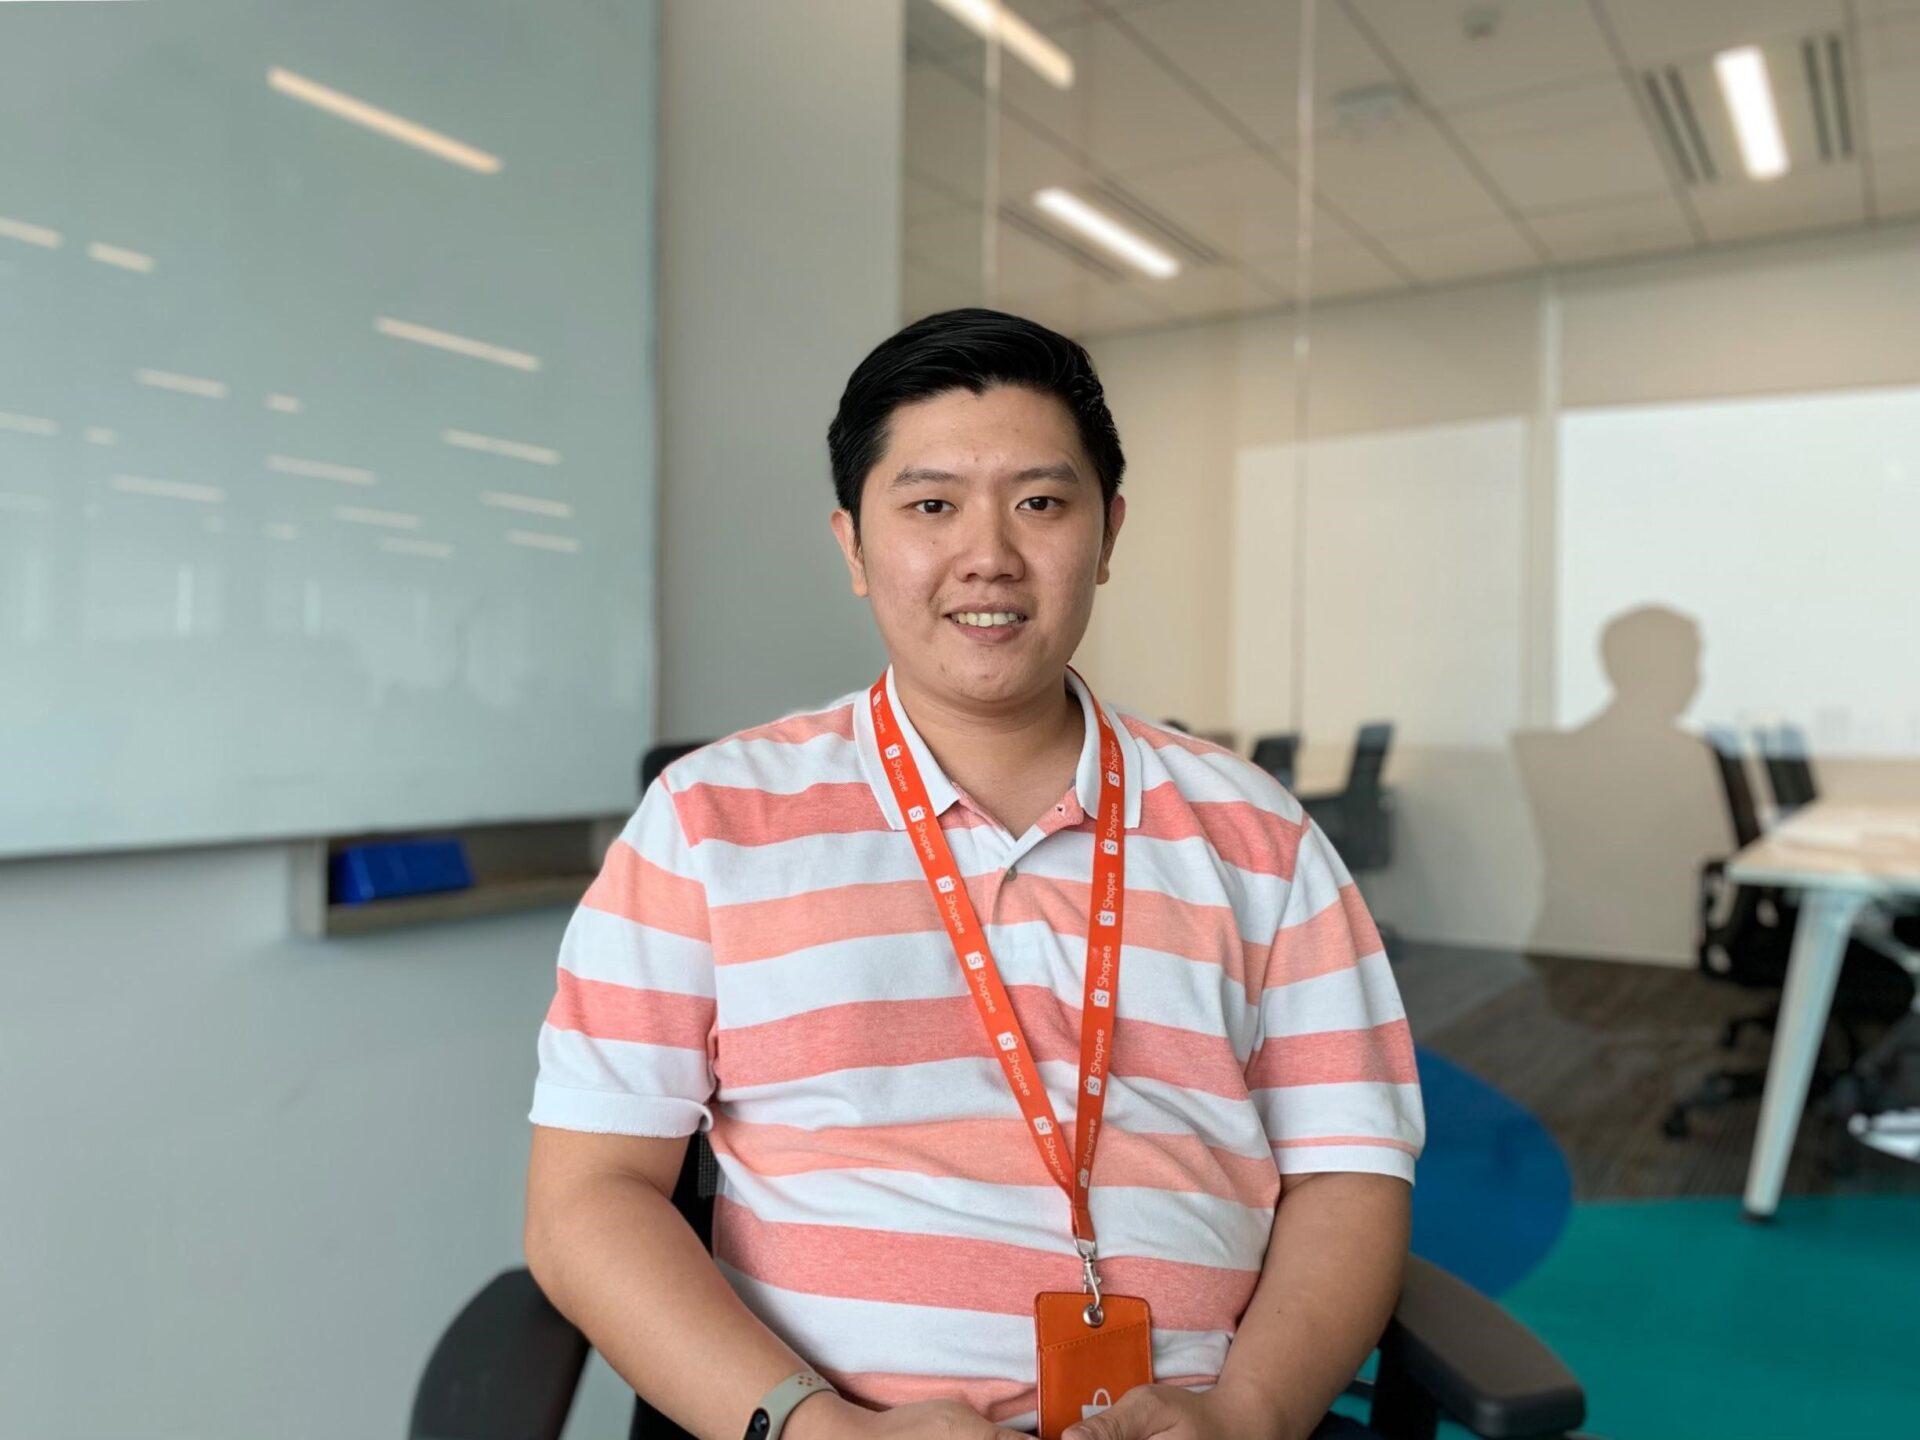 Alumni Story : Menilik Perjalanan Karier Sosok Steven Martono, Senior Business Intelligence di Shopee